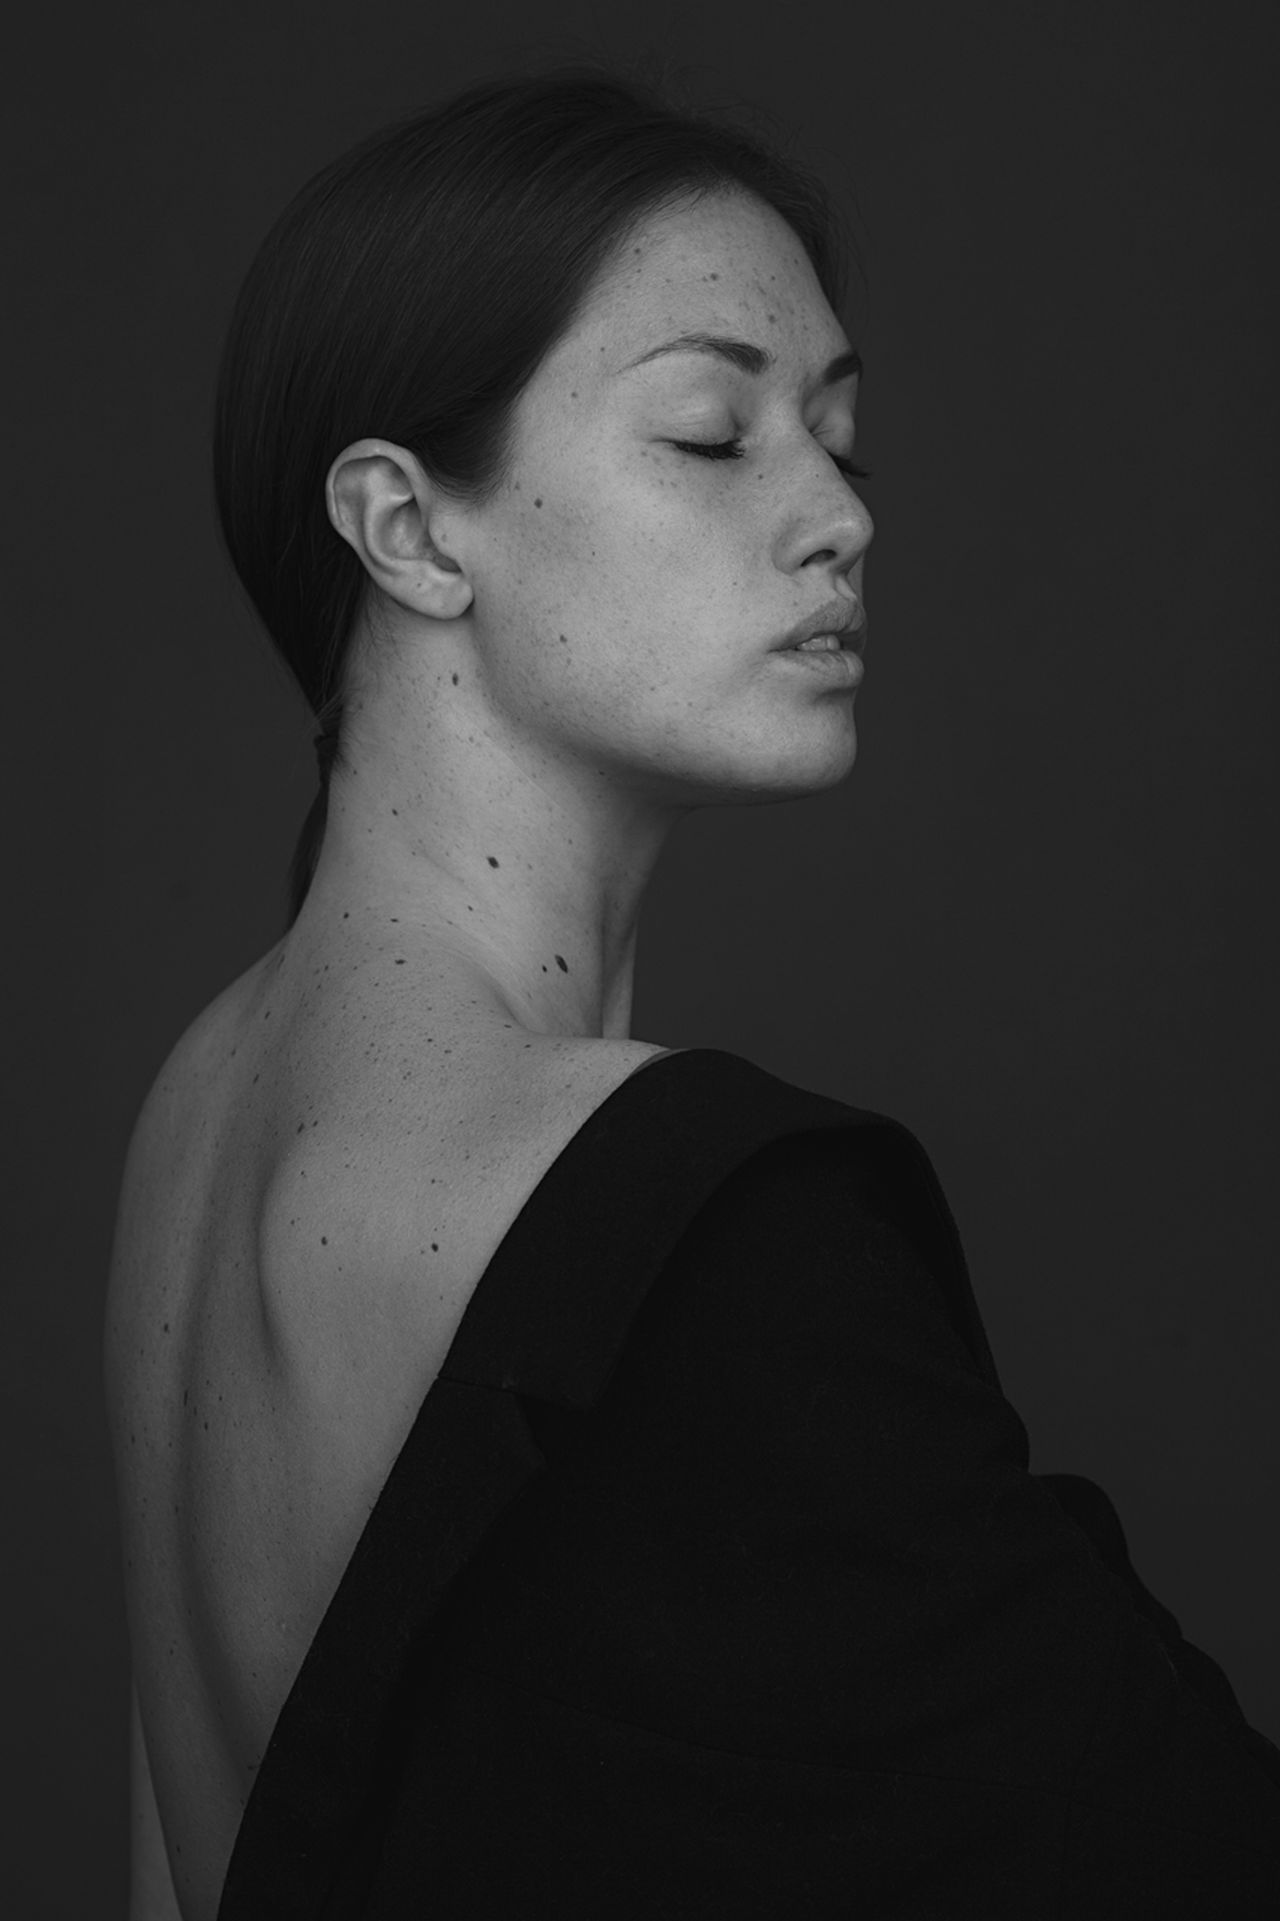 Adult Beautiful Woman Beauty Black Black & White Black And White Blackandwhite Model Portrait Studio Shot